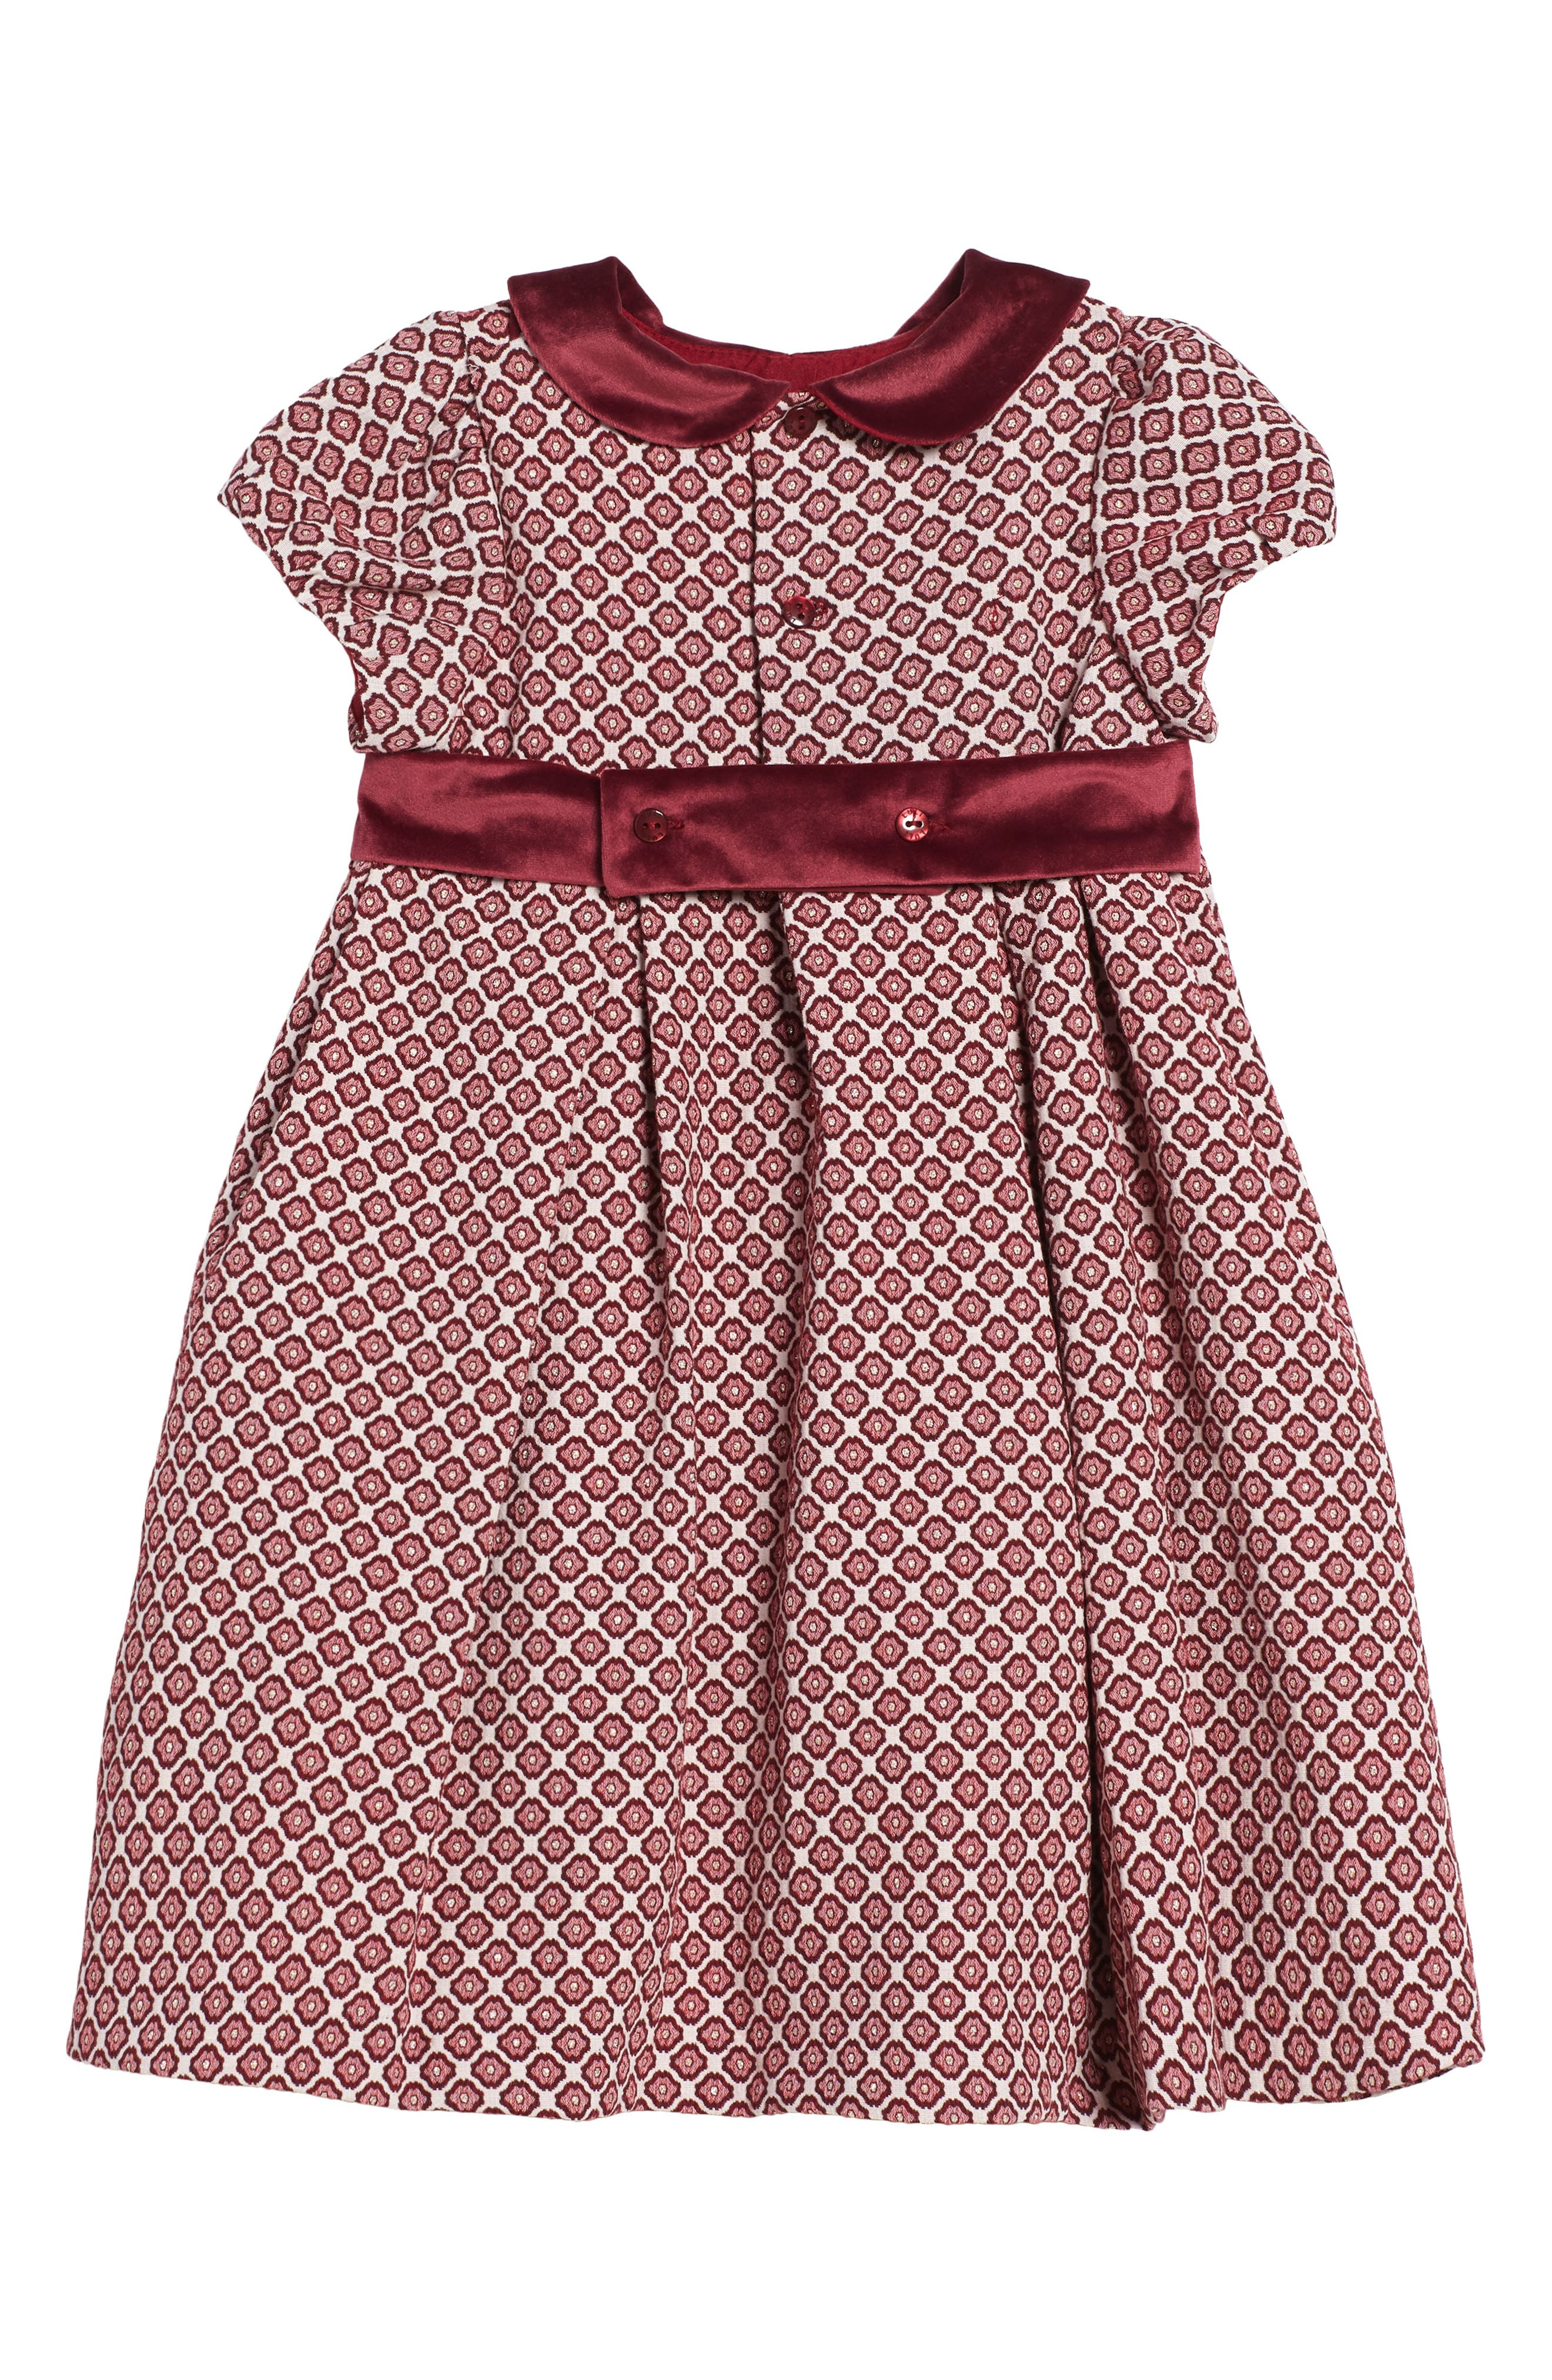 Floral Jacquard Dress,                             Alternate thumbnail 2, color,                             Burgundy